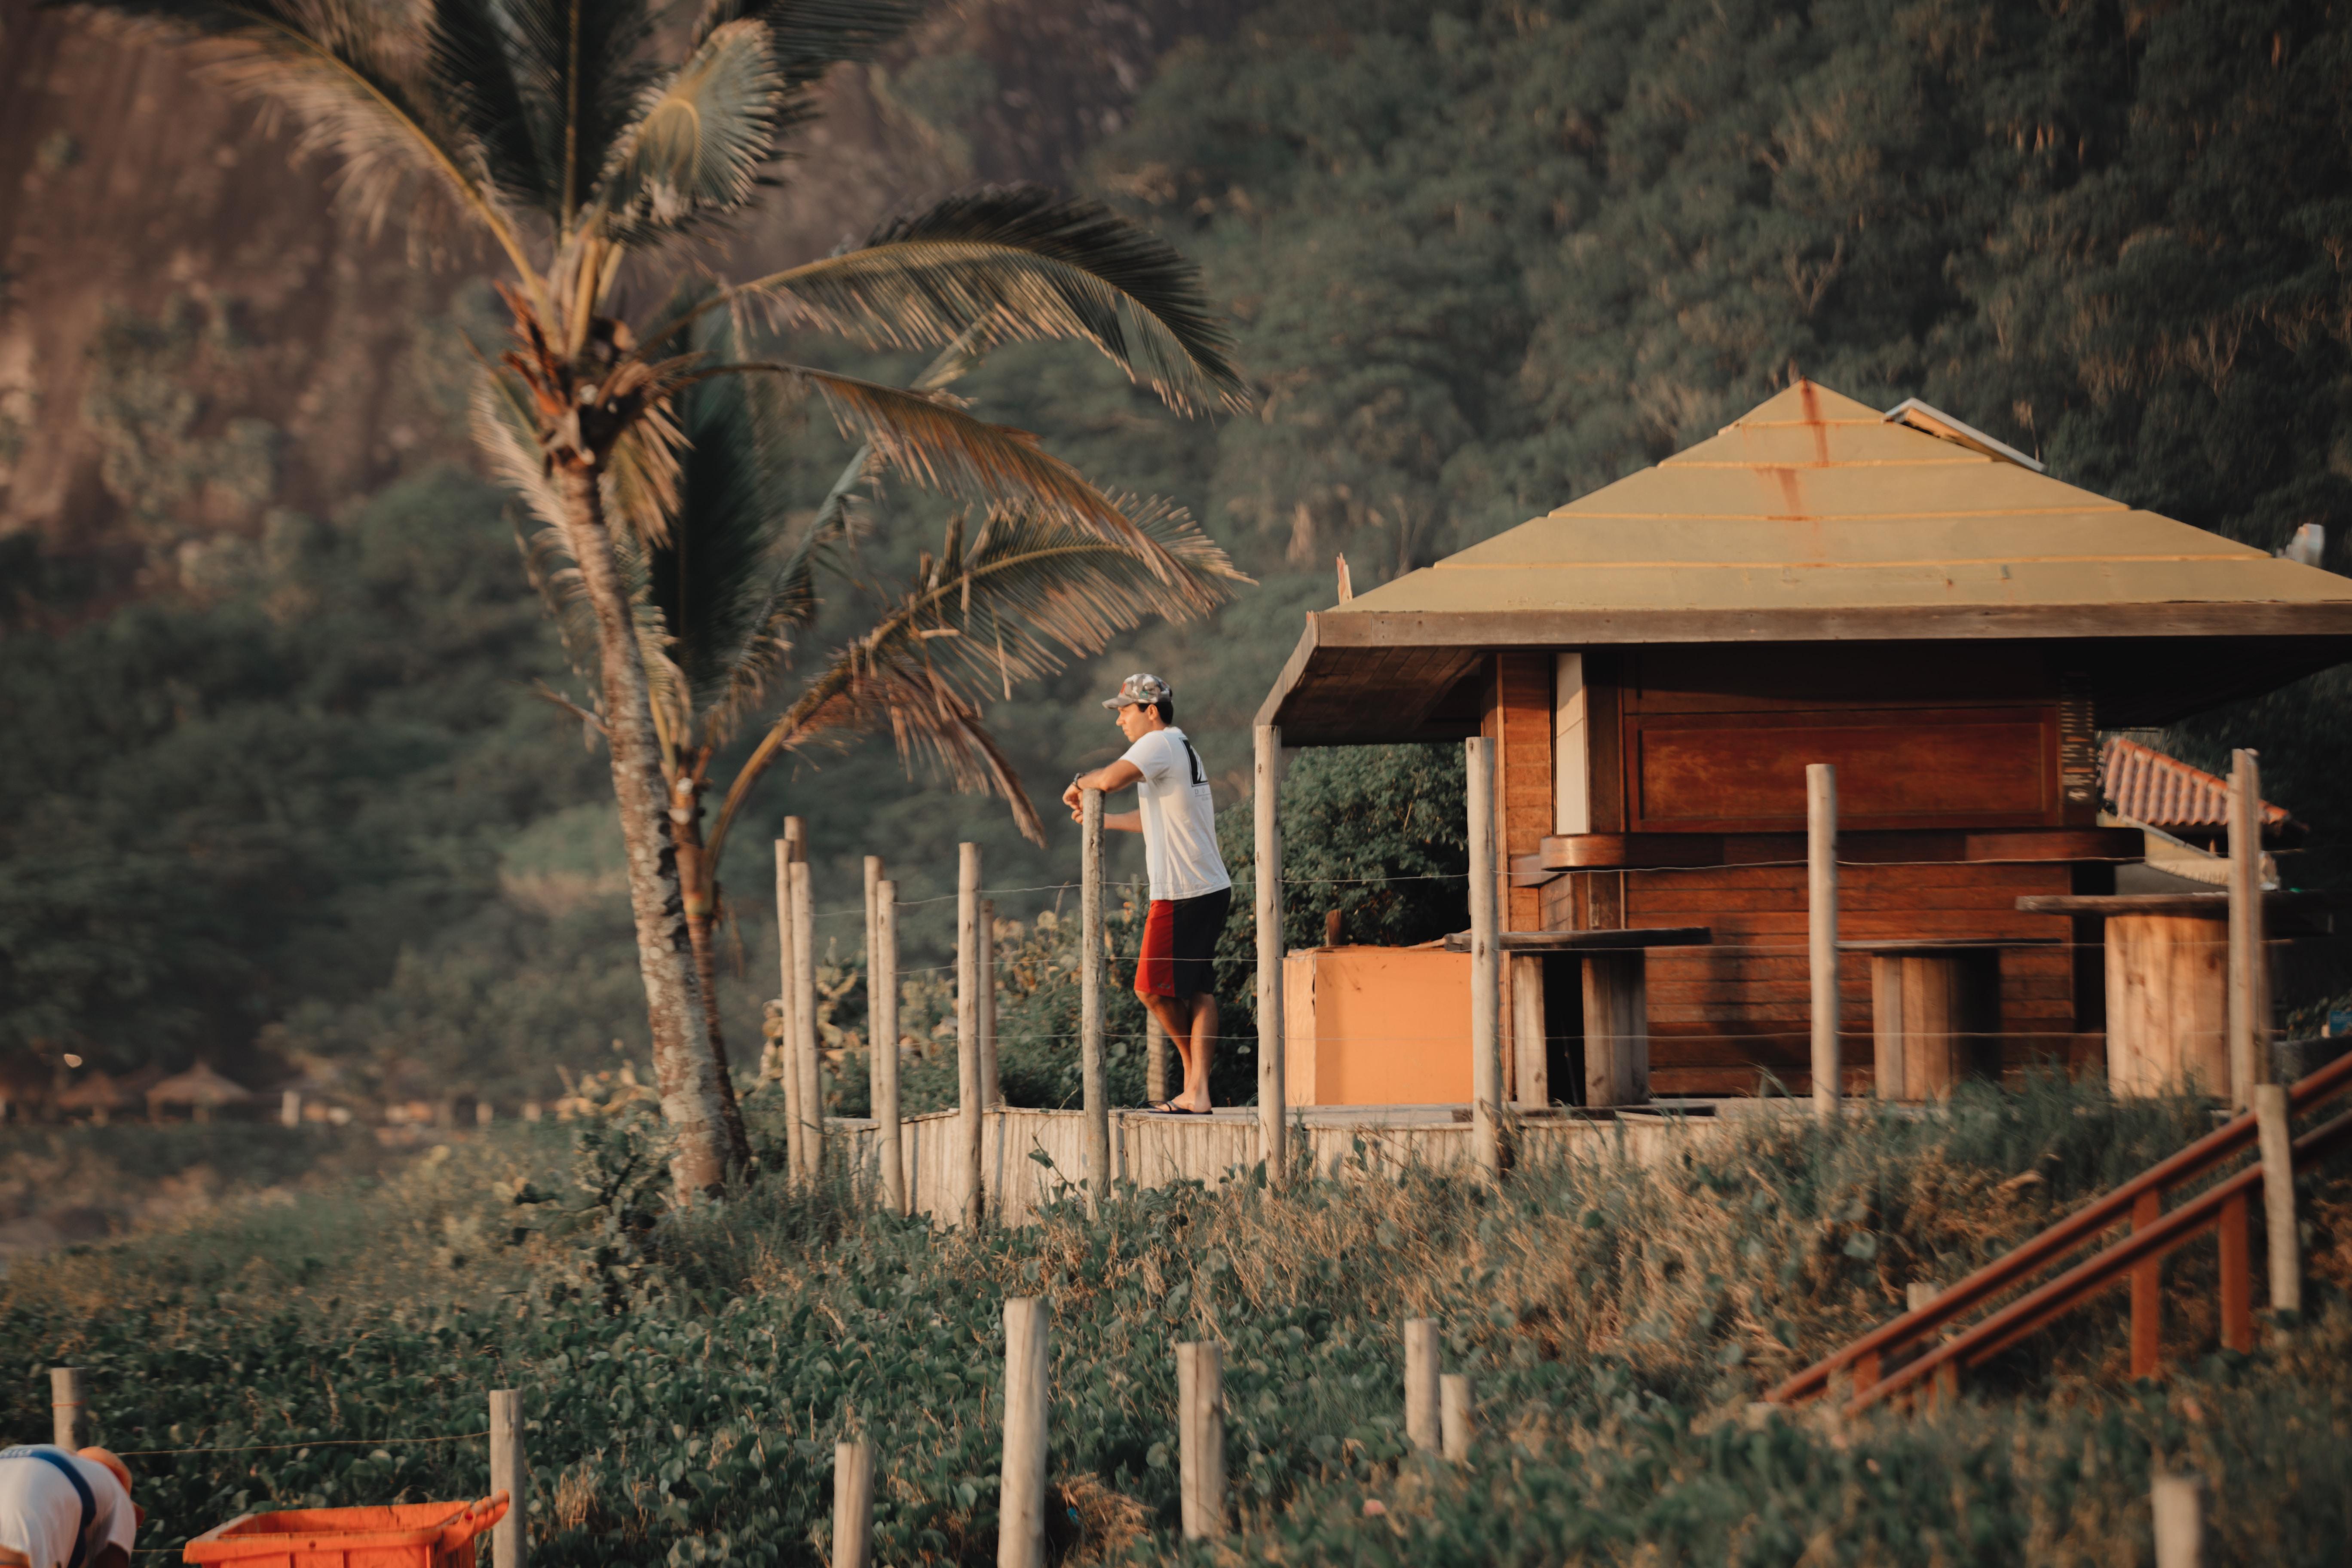 man standing on wooden hut